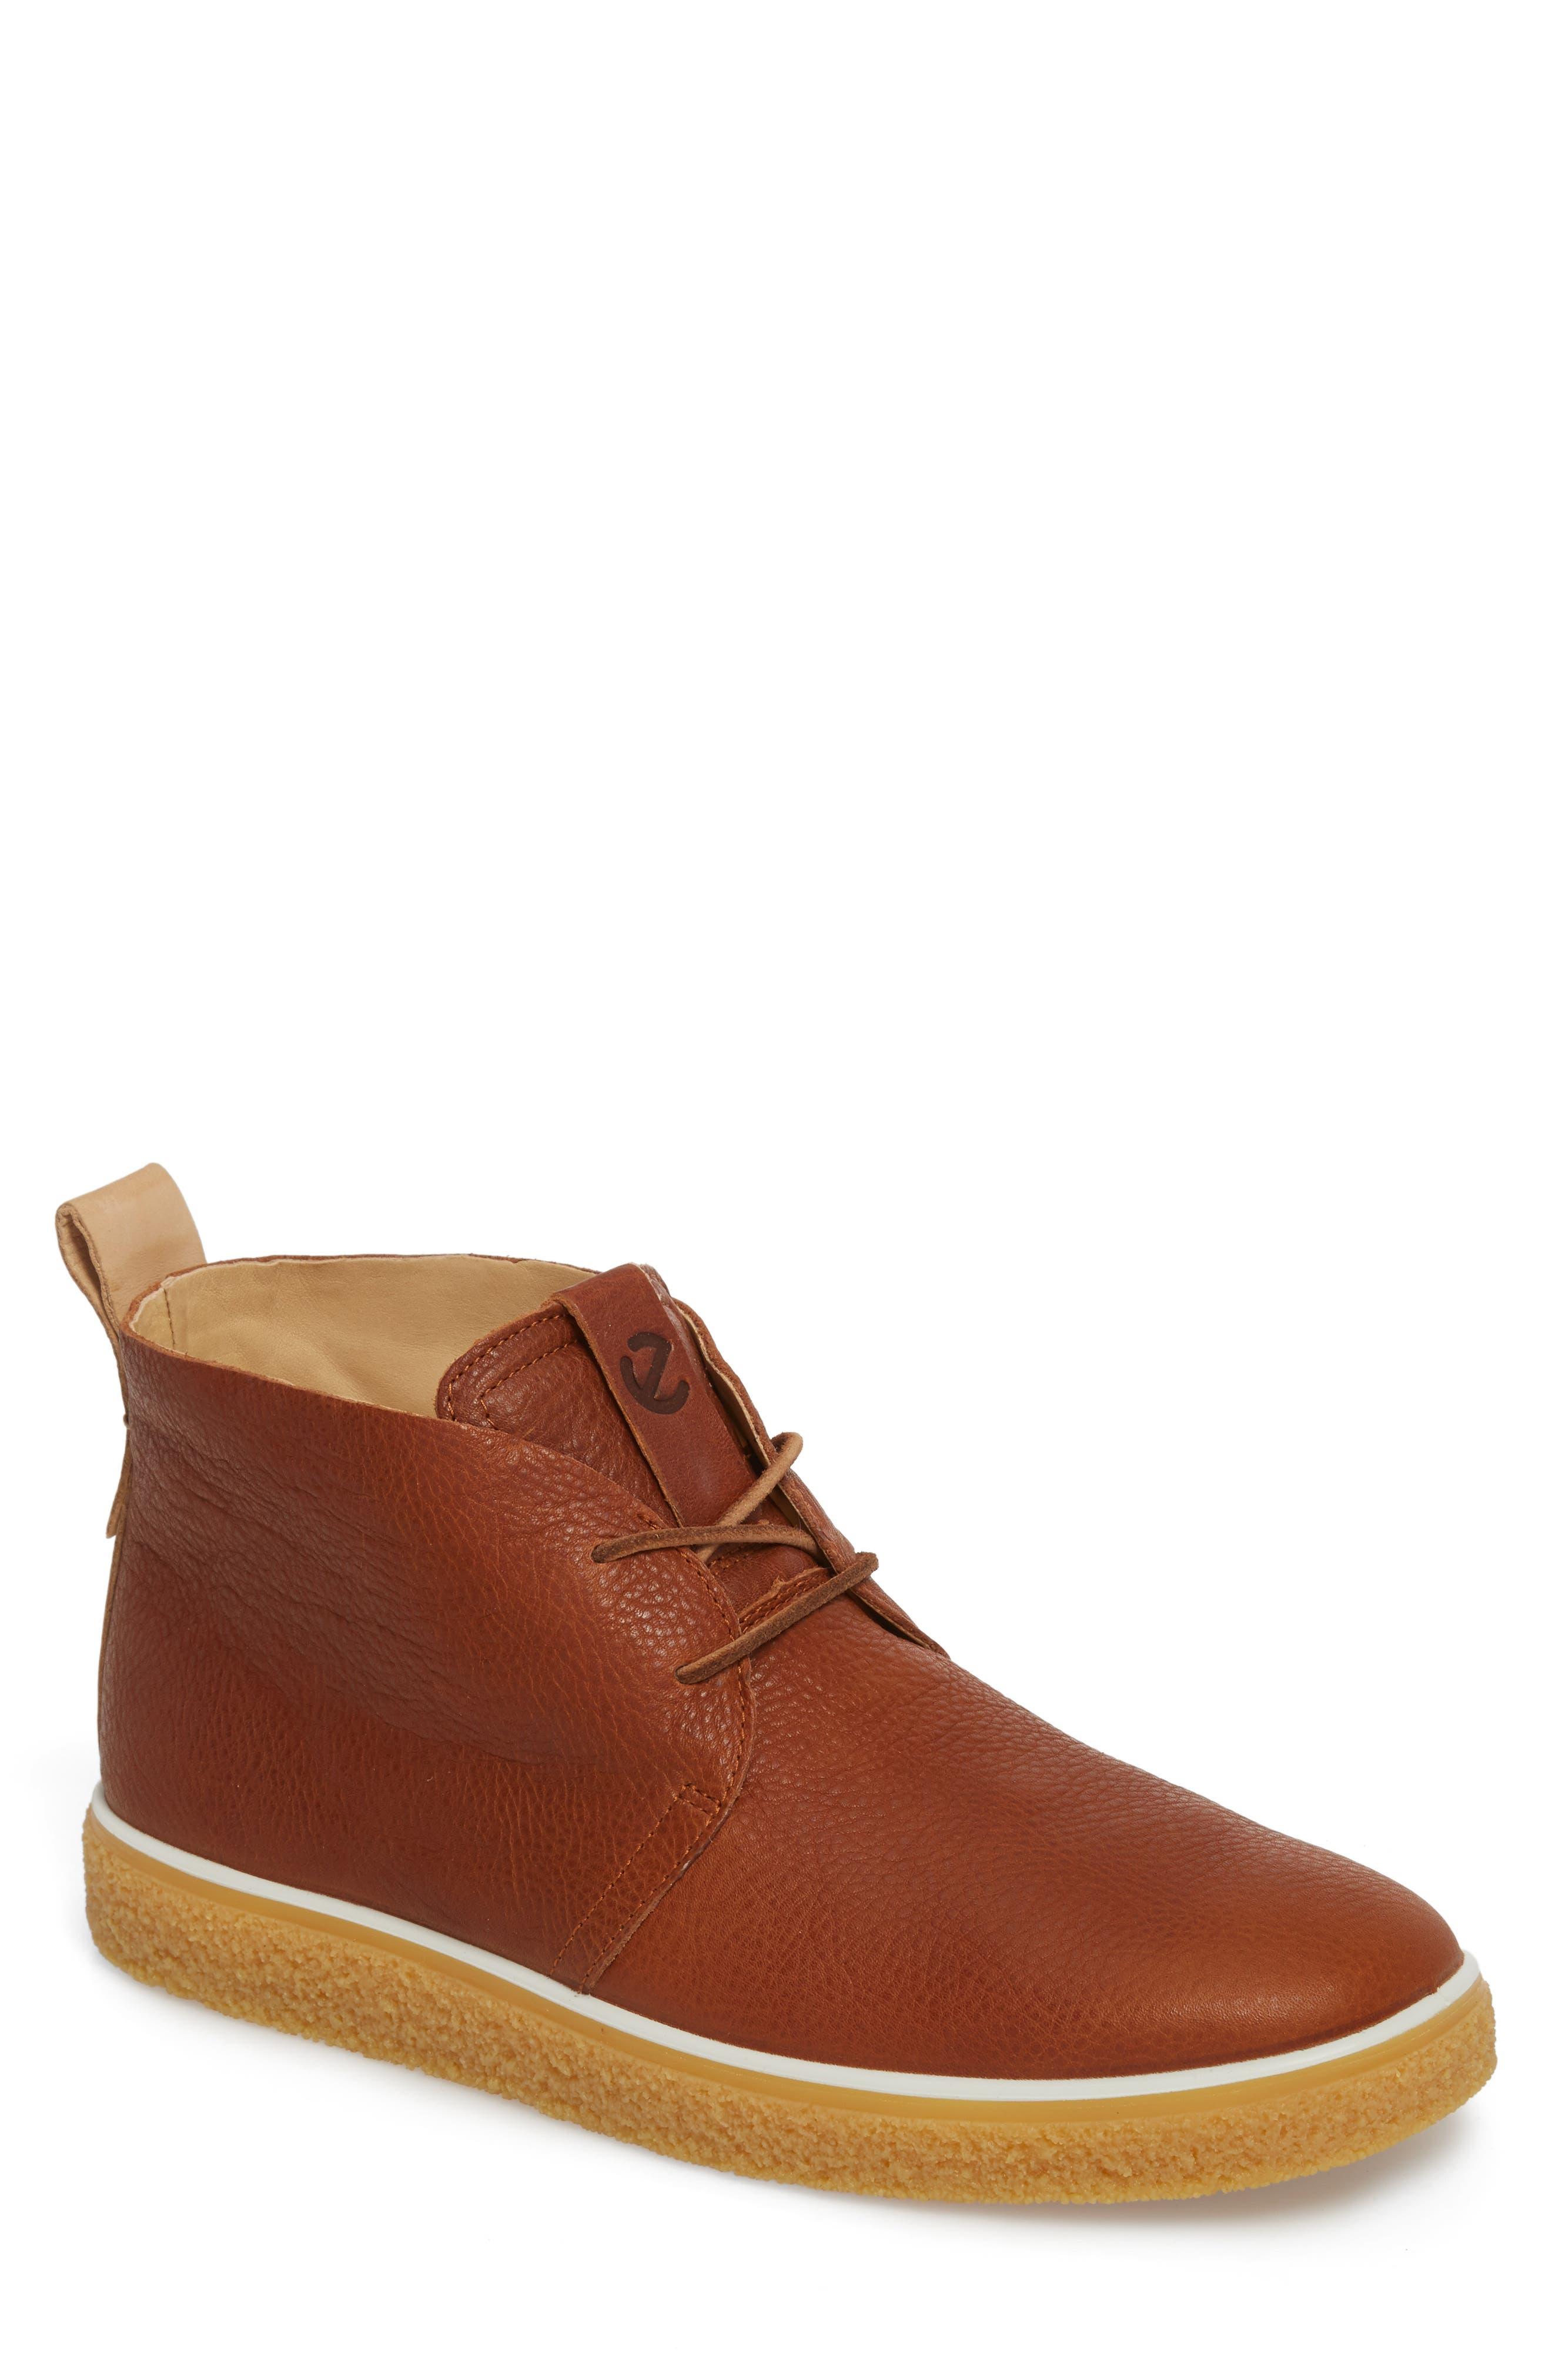 Crepetray Chukka Boot,                         Main,                         color, Lion Leather